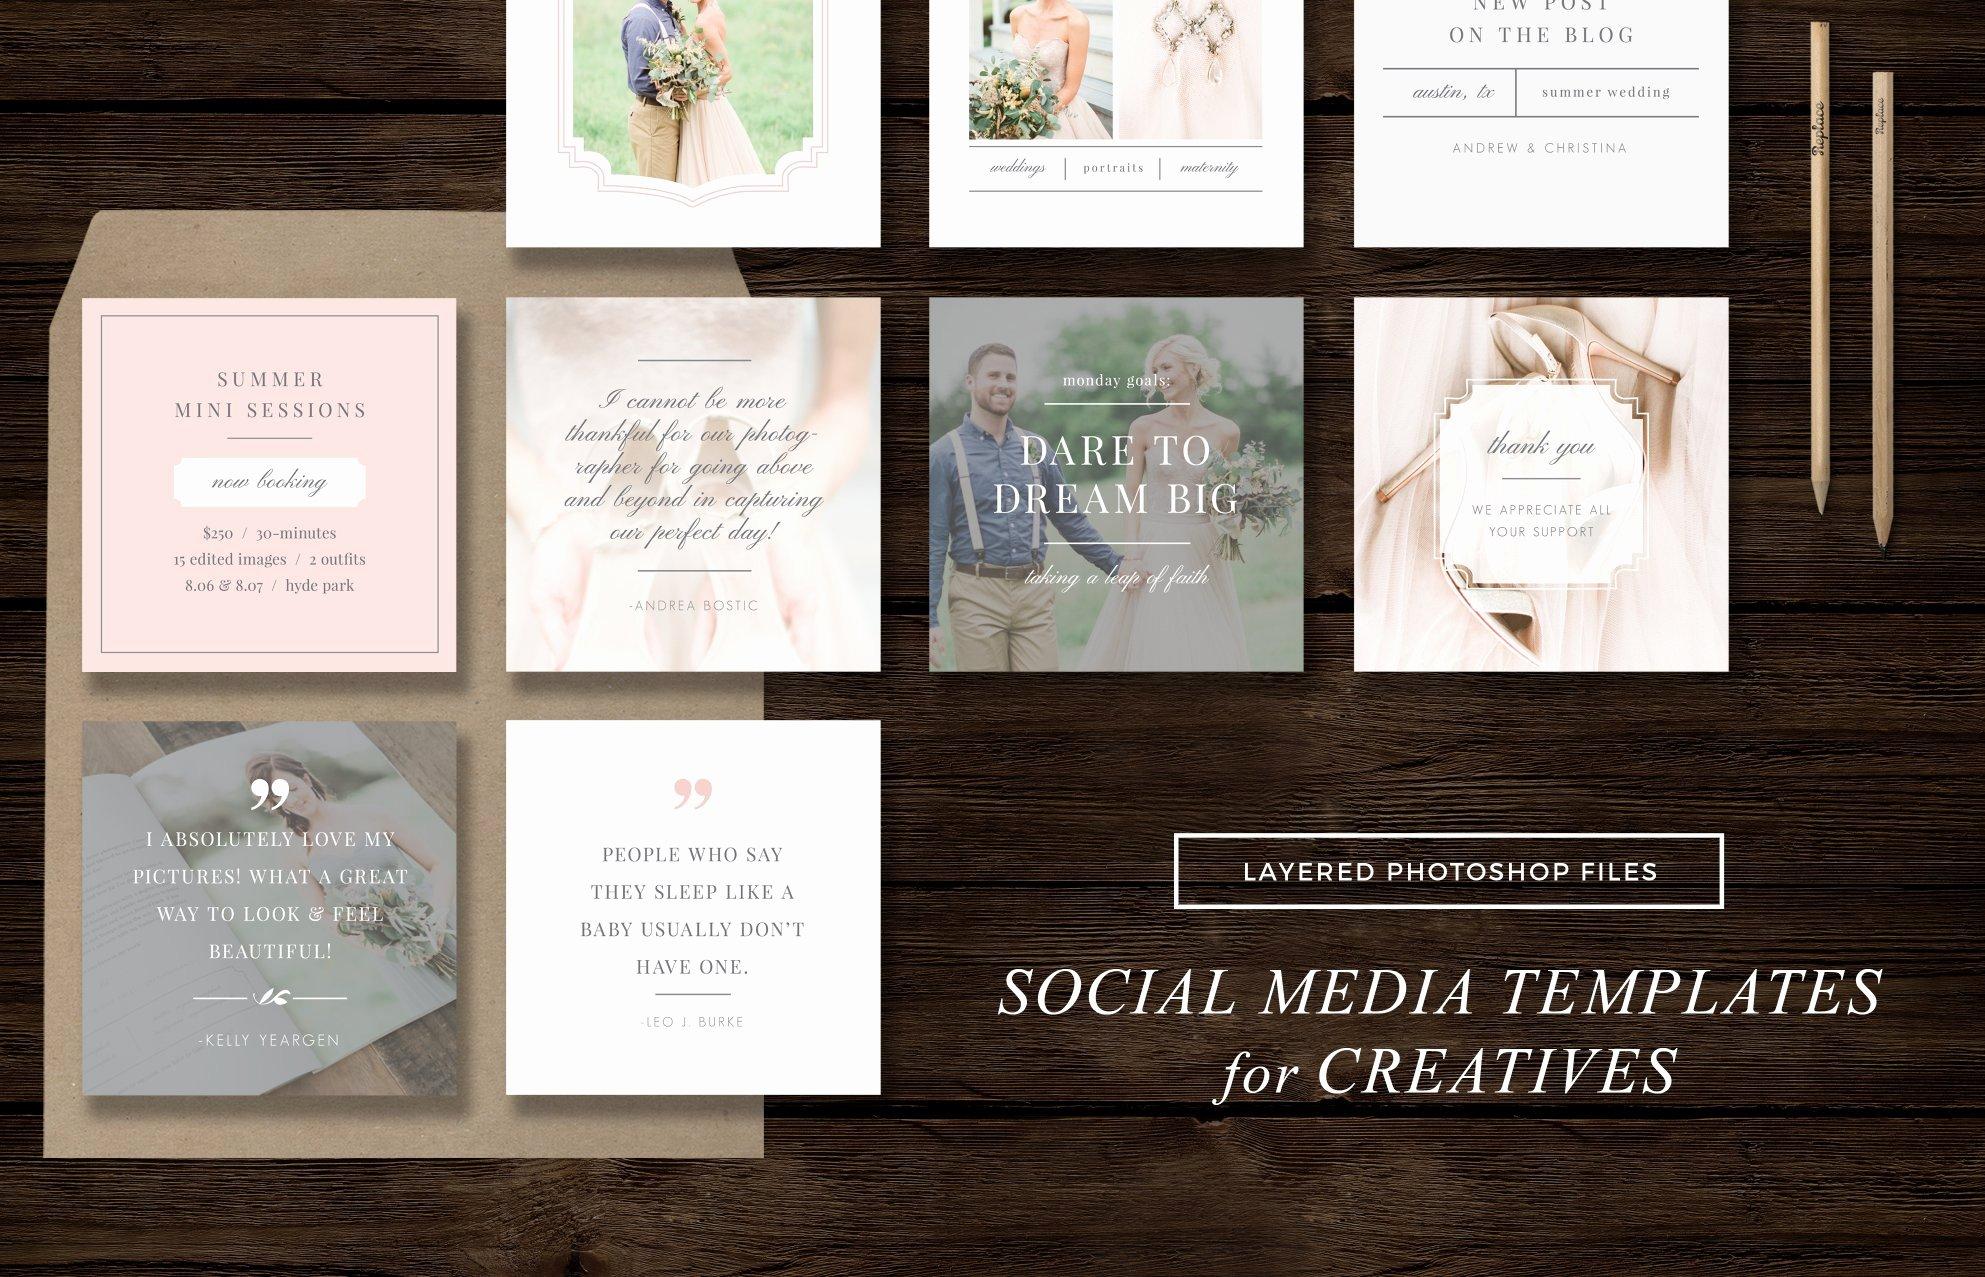 Social Media Website Template Inspirational social Media Templates Instagram Web Elements